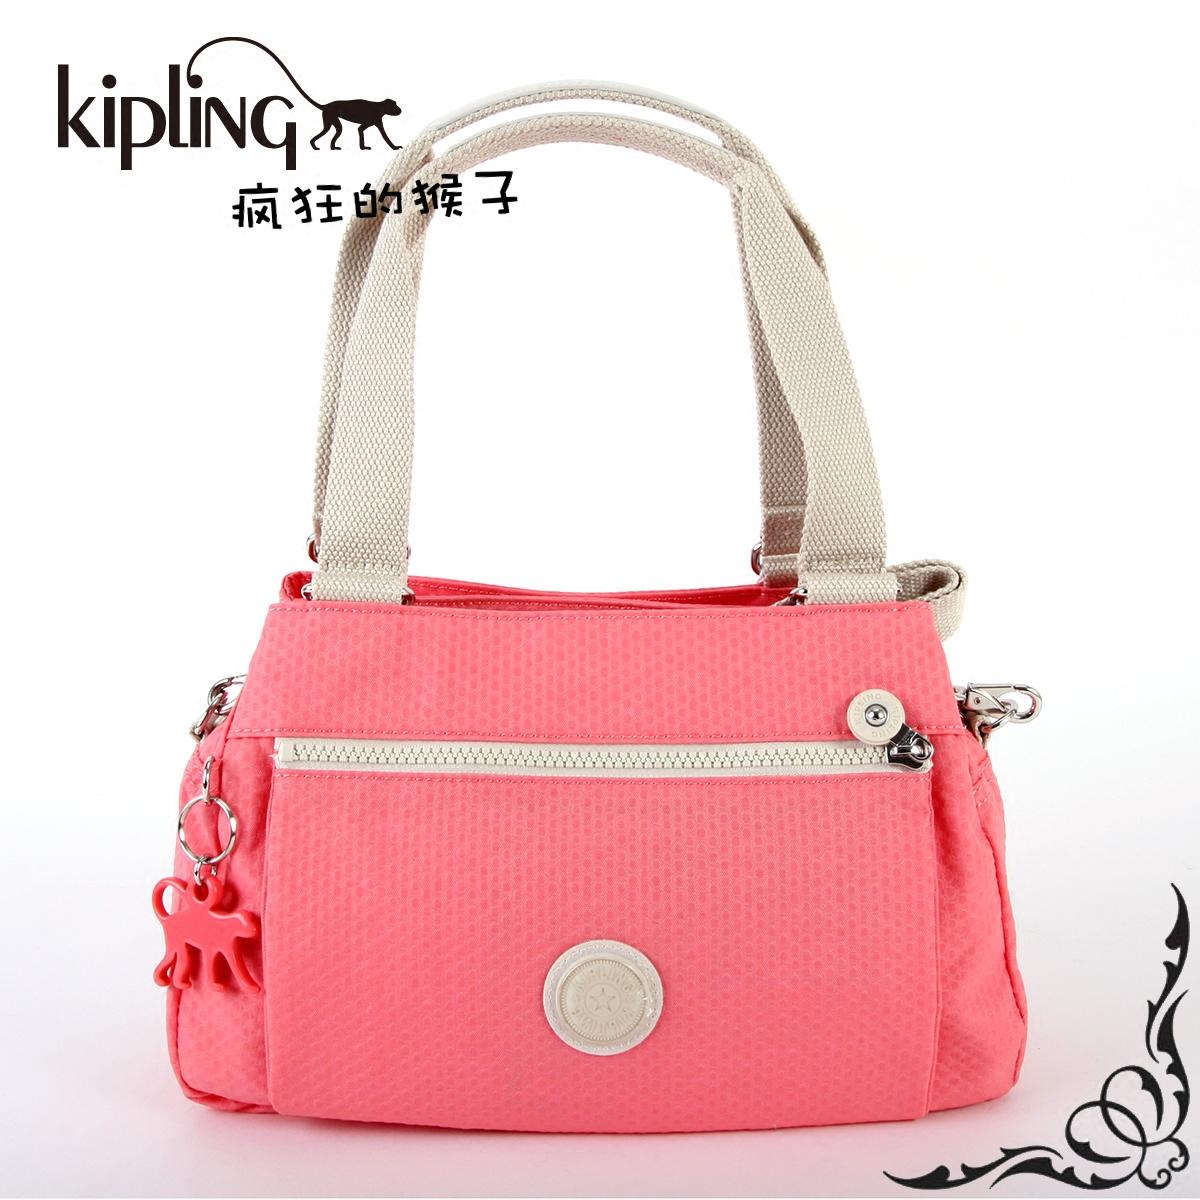 сумка Kipling купить : Kipling k spf orelie